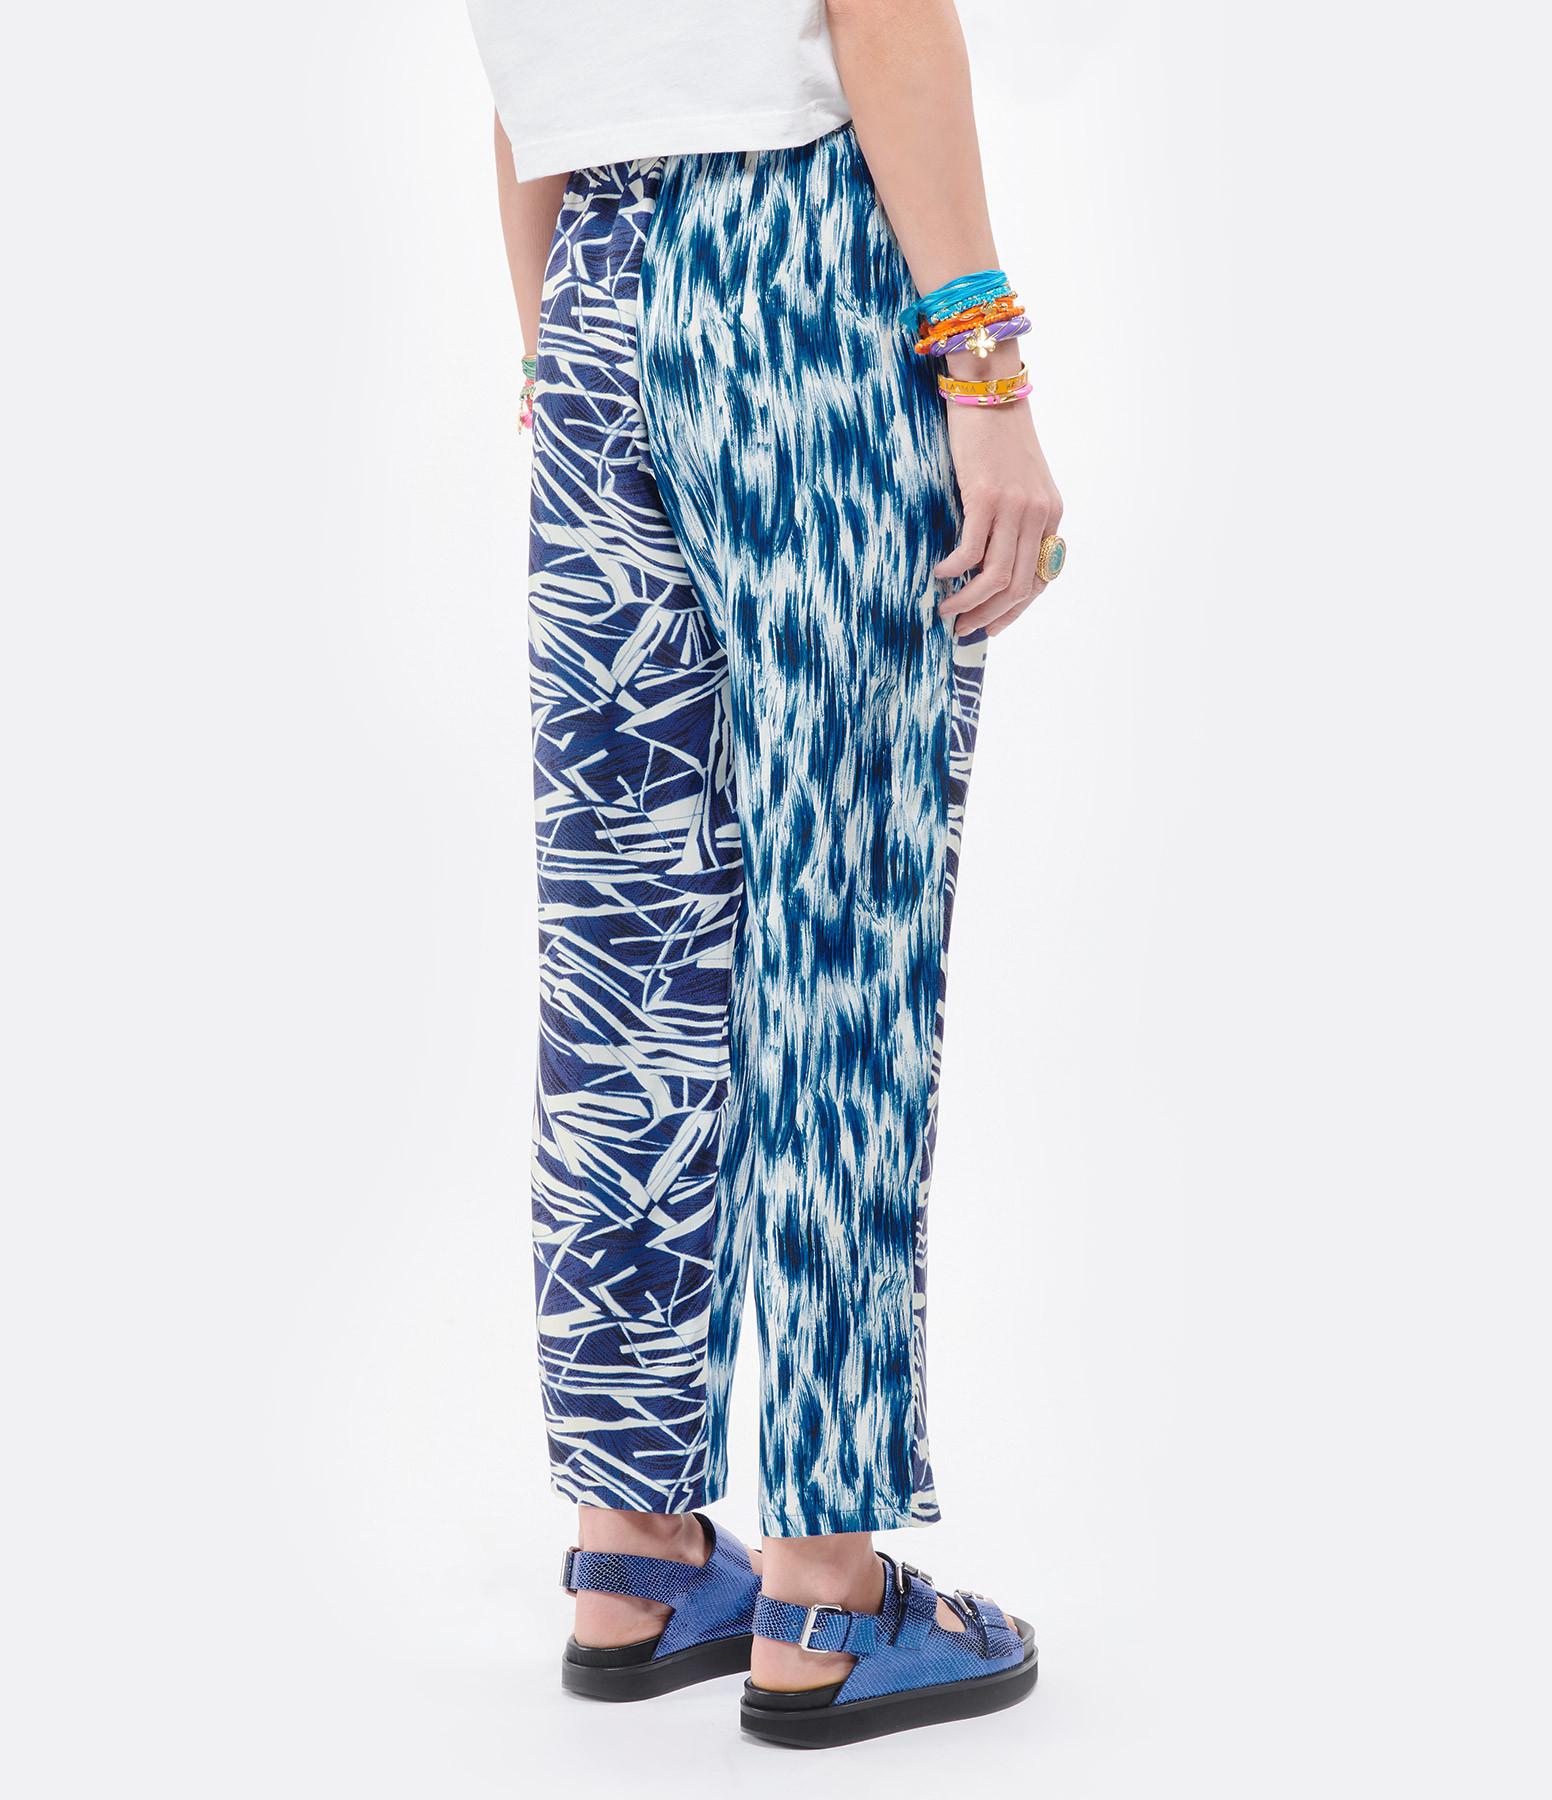 PIERRE-LOUIS MASCIA - Pantalon Aloe Soie Imprimé Blanc Bleu